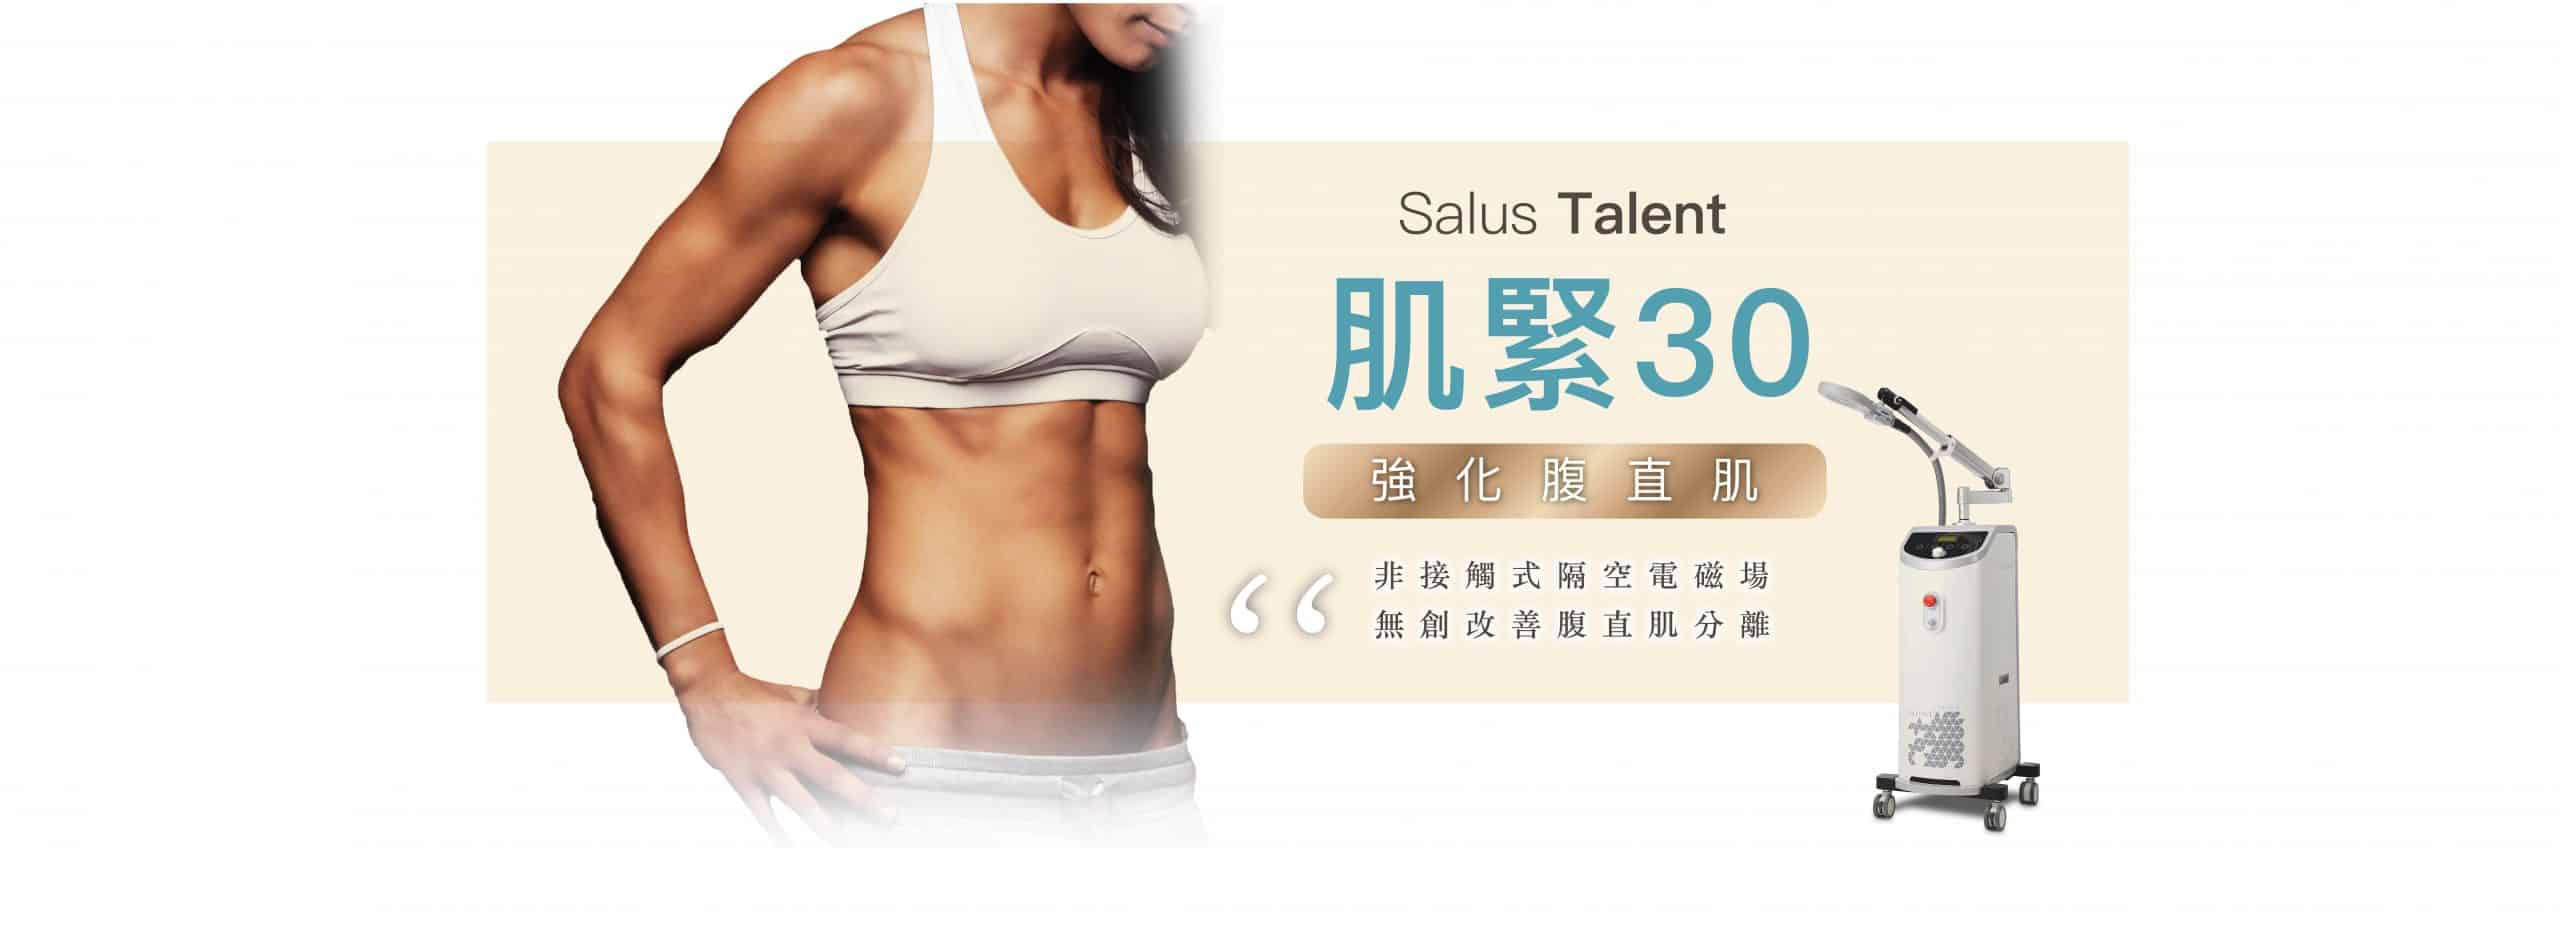 Salus talent Salus Talent PtoP 12 scaled